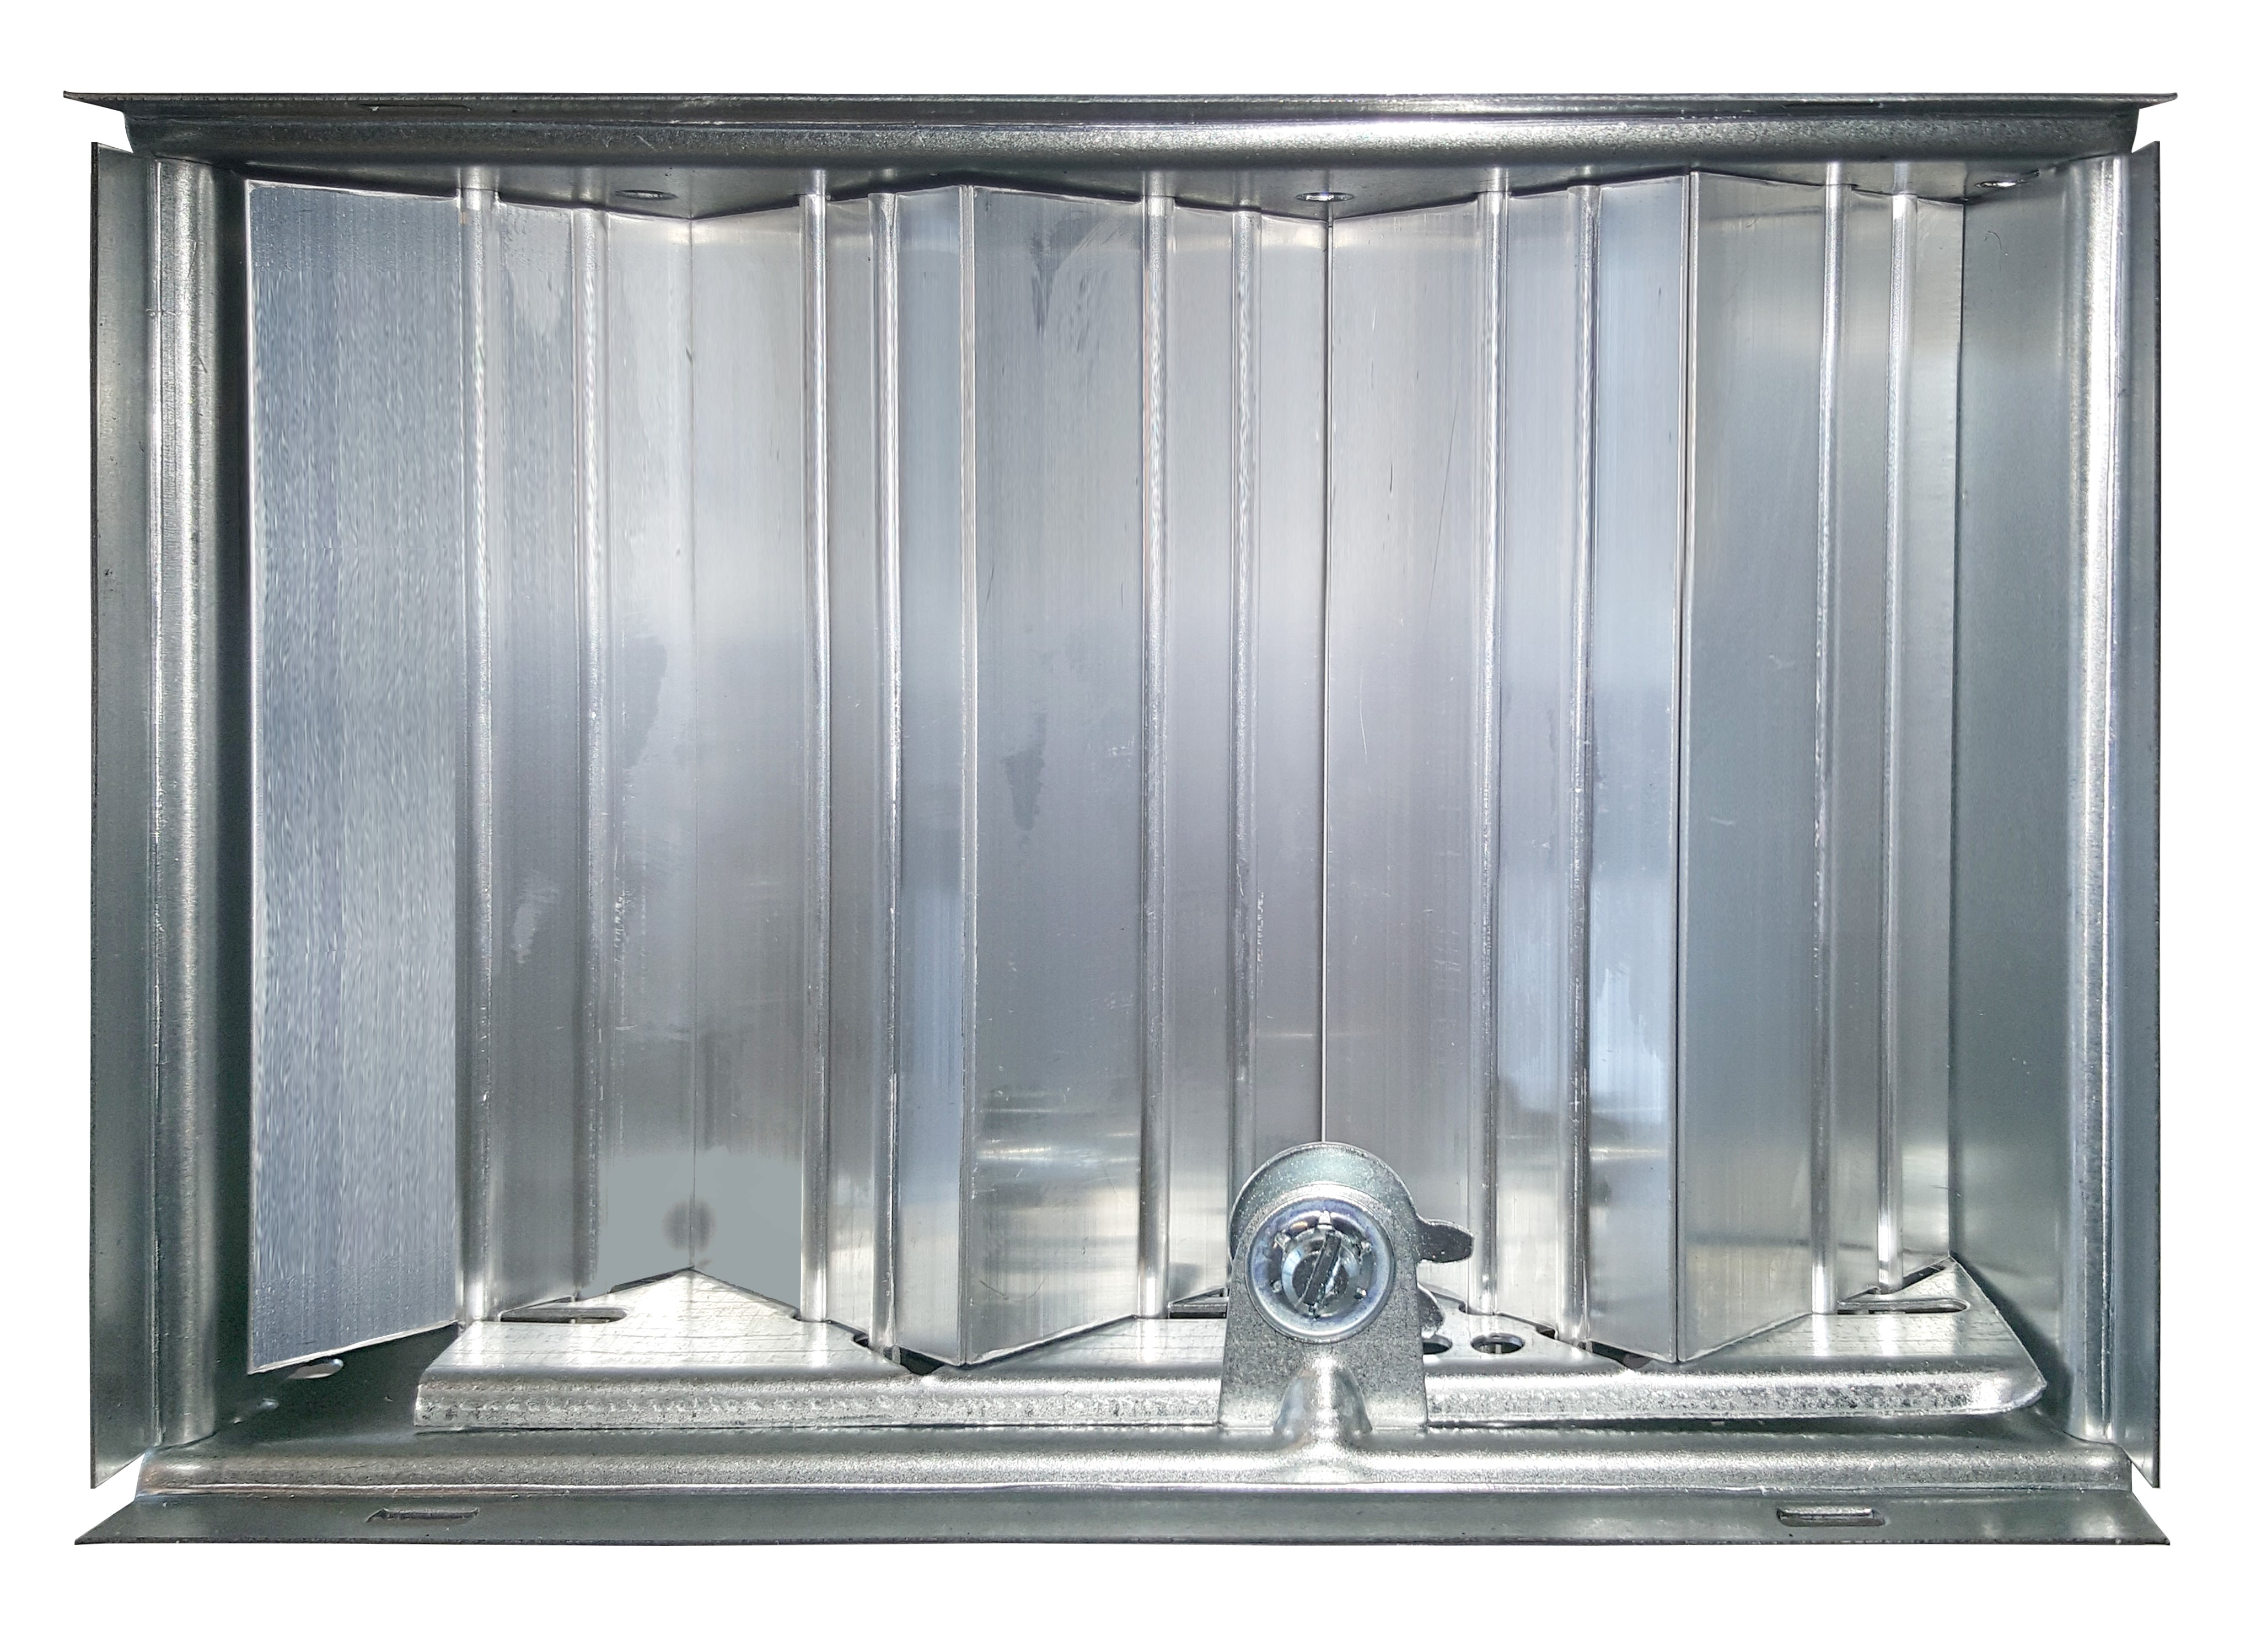 Serranda di regolazione a contrasto per bocchette dimensione 1000x100 mm serie BBMA/BGRA